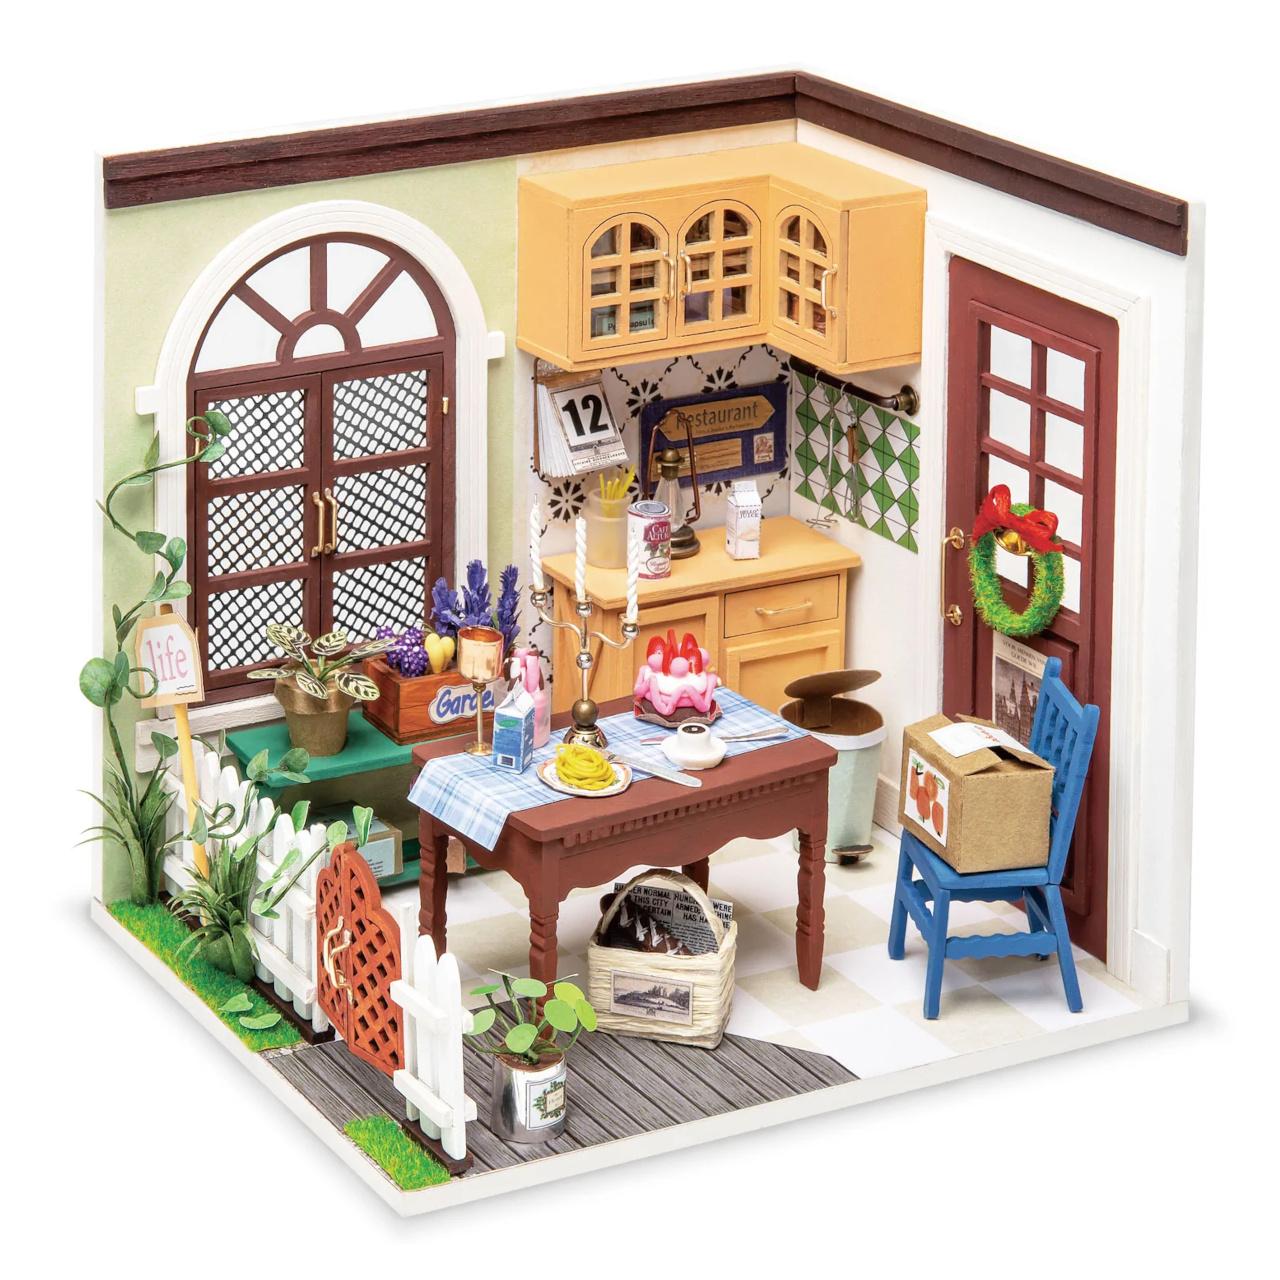 RoboTime miniatura domečku Jídelna